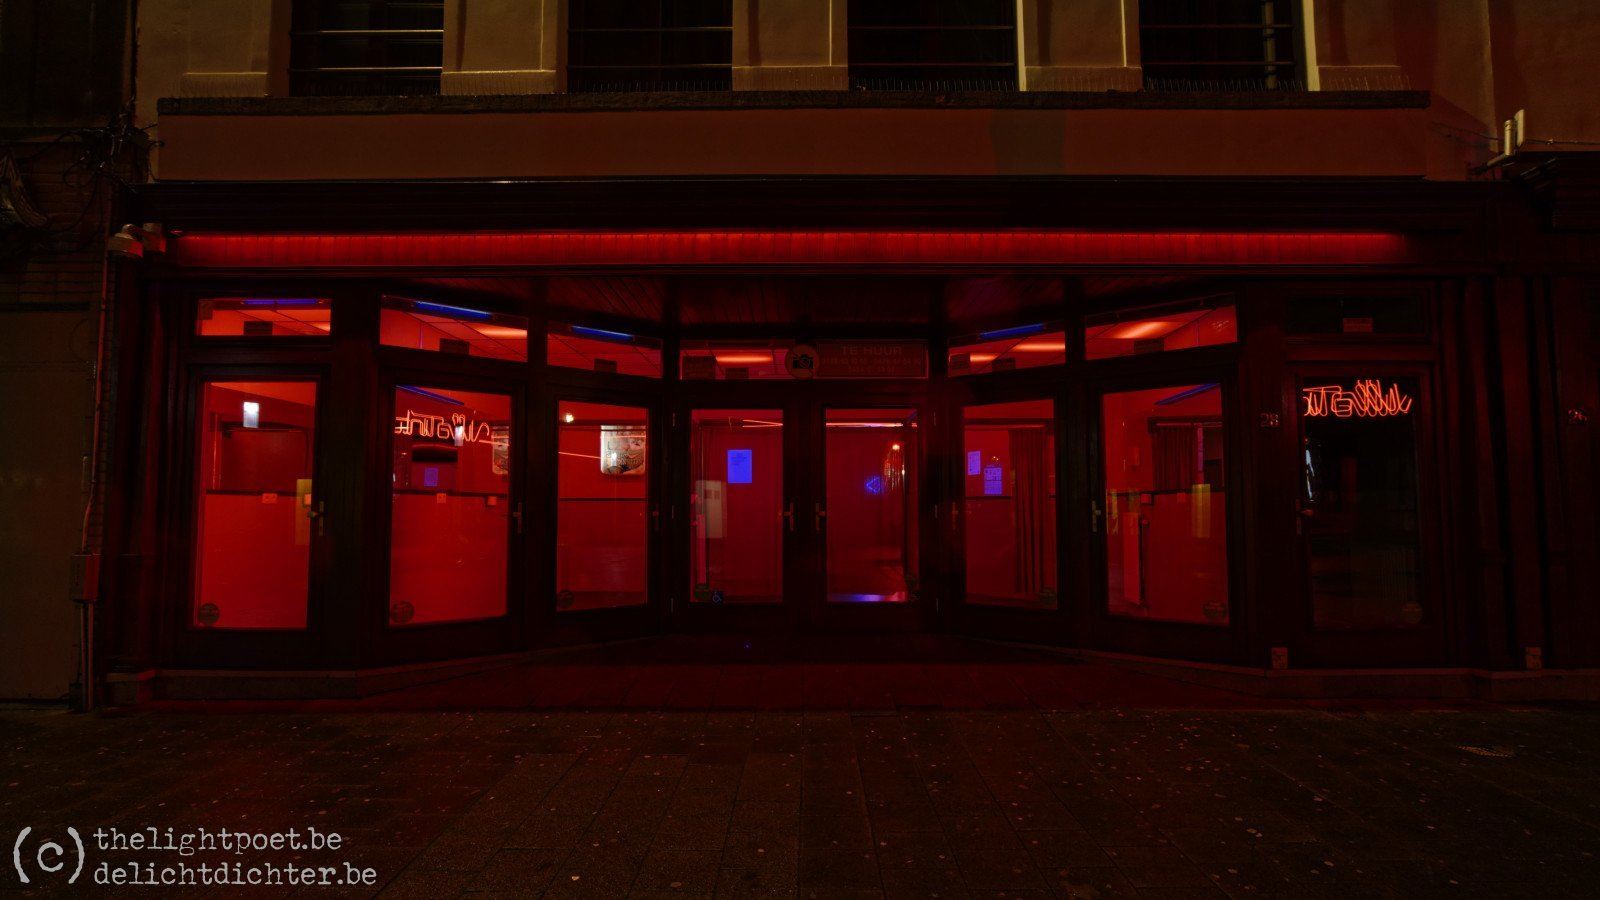 2020_03_Antwerpen_20200320_205021_DxO_PL3_1600px